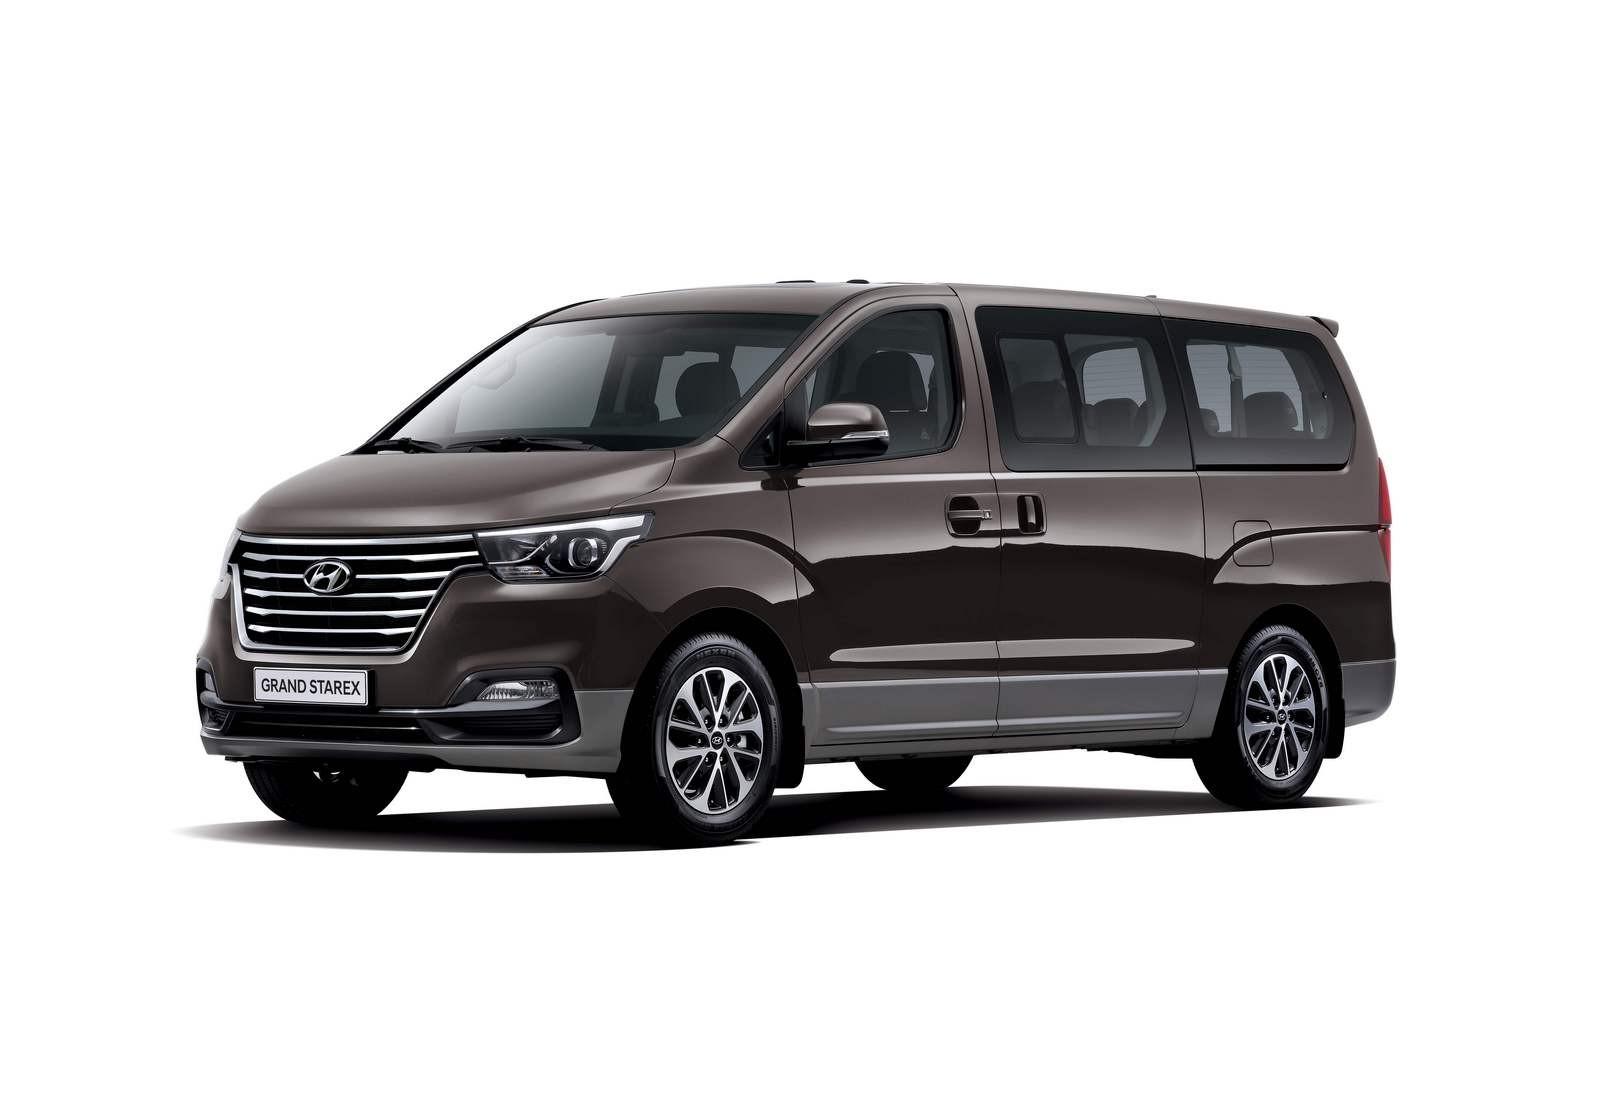 صور مواصفات هونداي h1 2019 , تعرف على اسعار و موصفات السيارة هونداي H1 بالسعودية